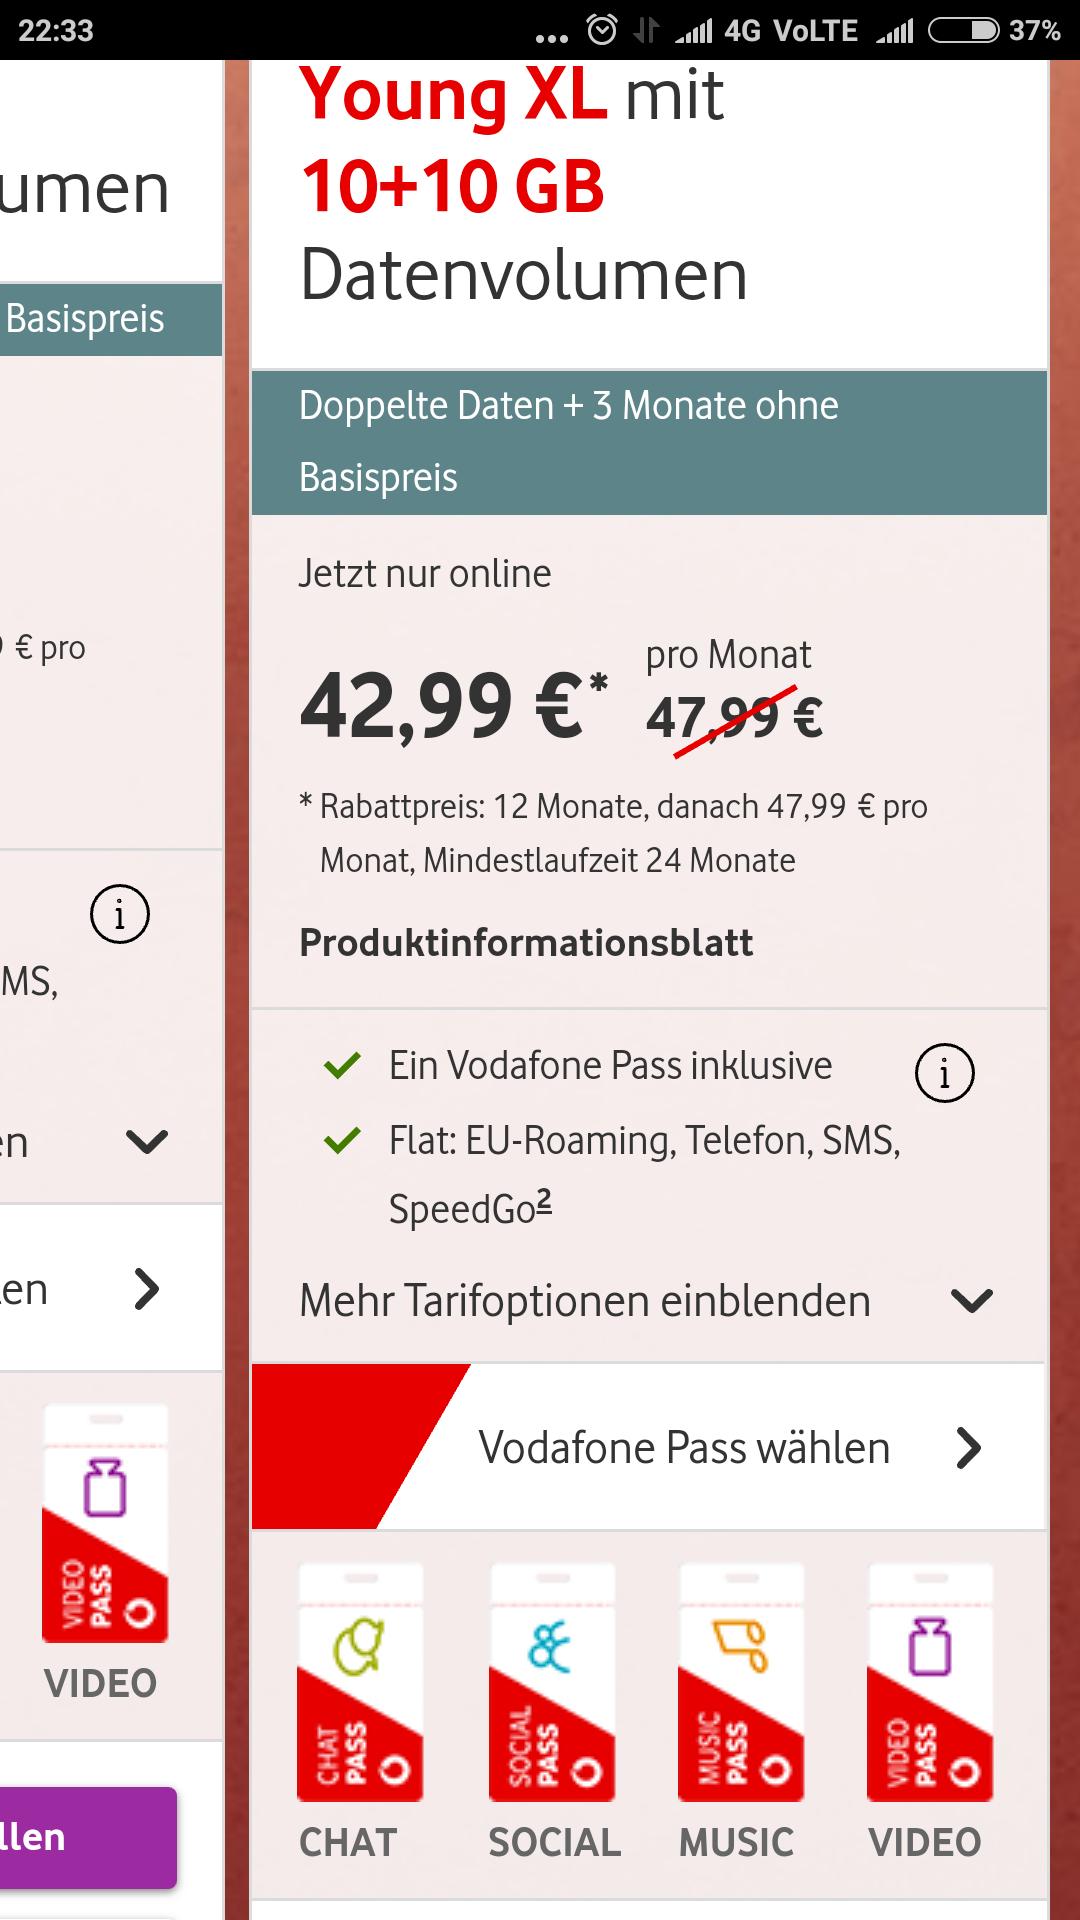 Young XL10 GB + 10GB +Vodafone Pass und  GigaDepot